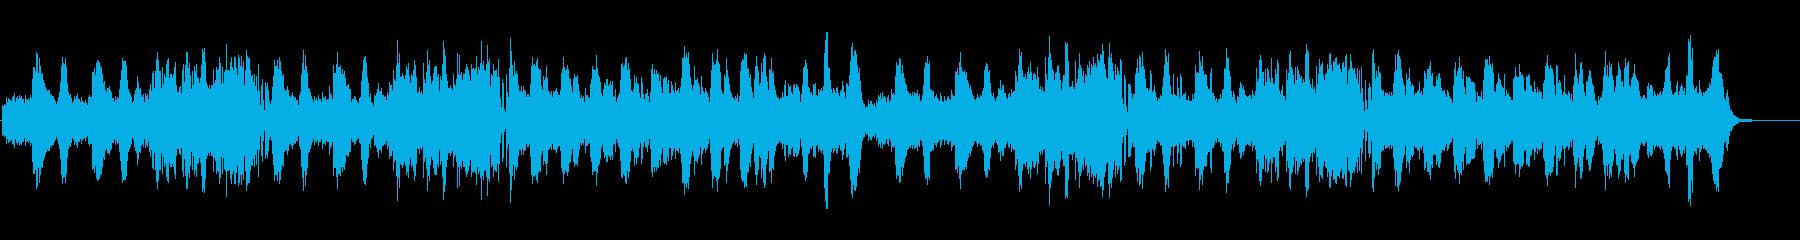 DREAMS/ドリームスの再生済みの波形